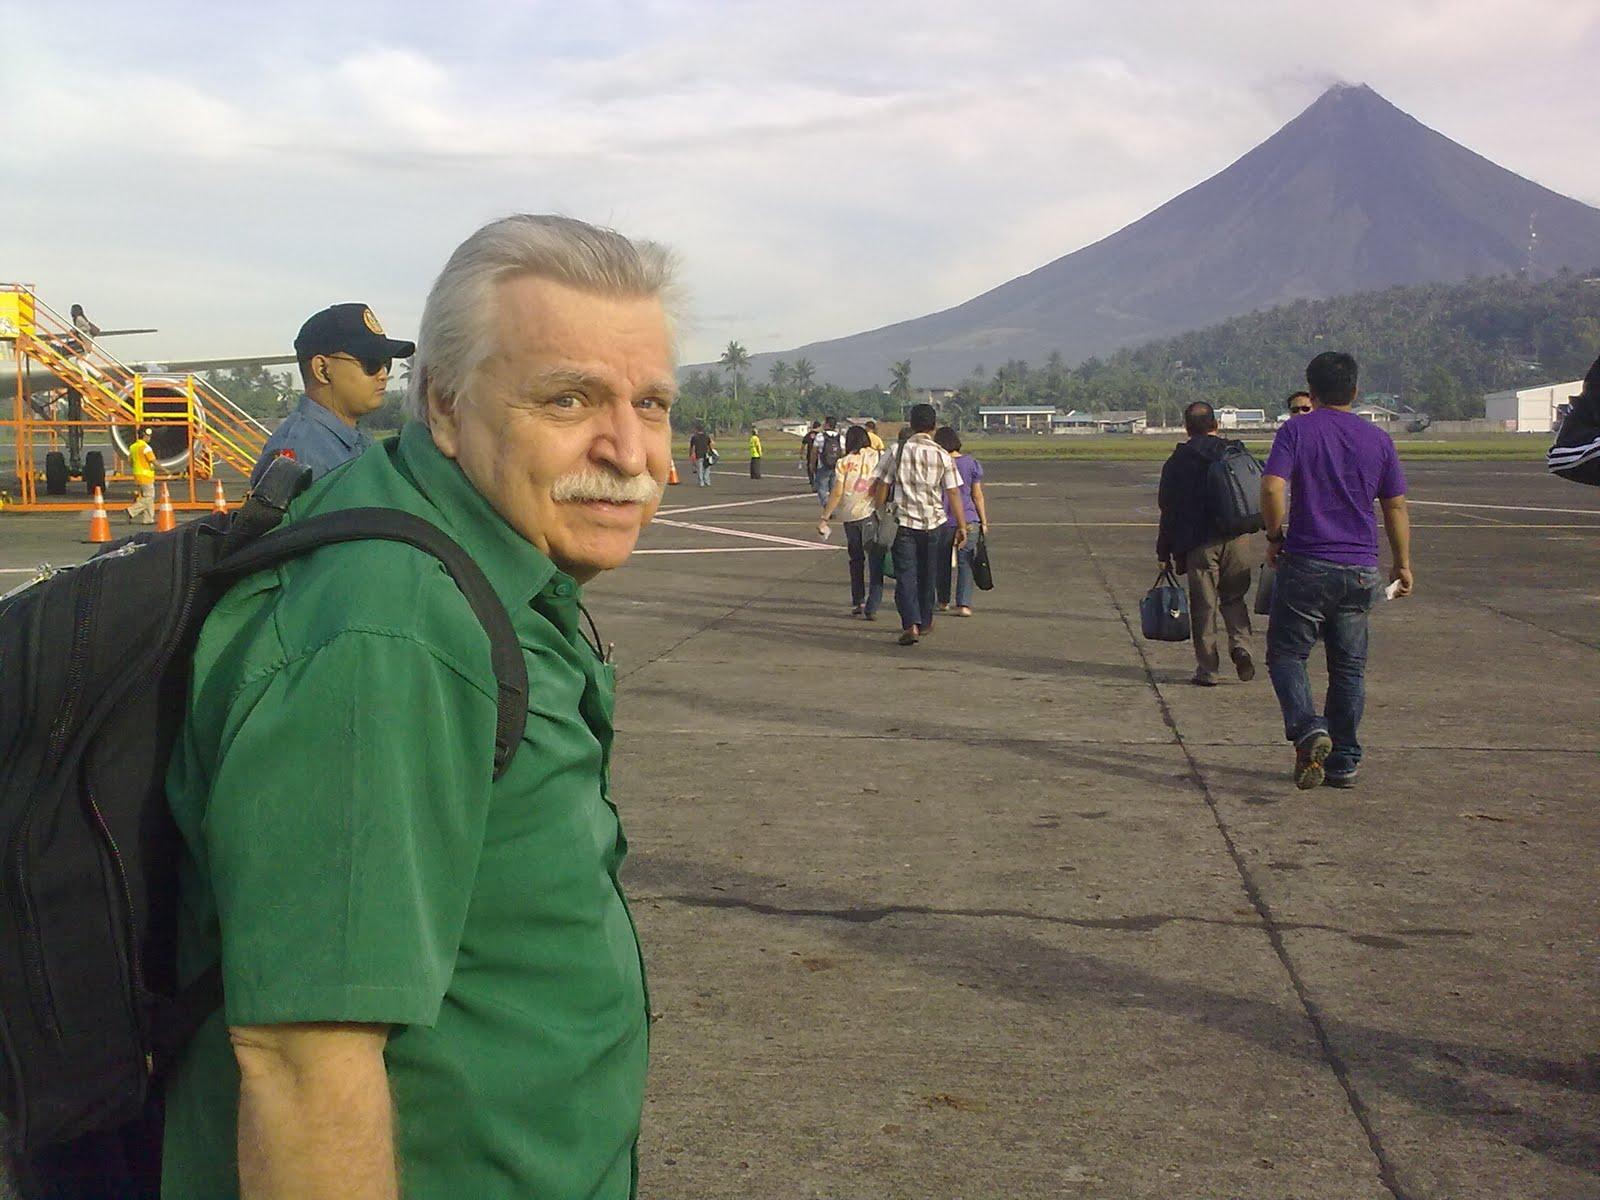 14 Sep. 2010 first leg of my long journey to Autralia Legazpi to Manila